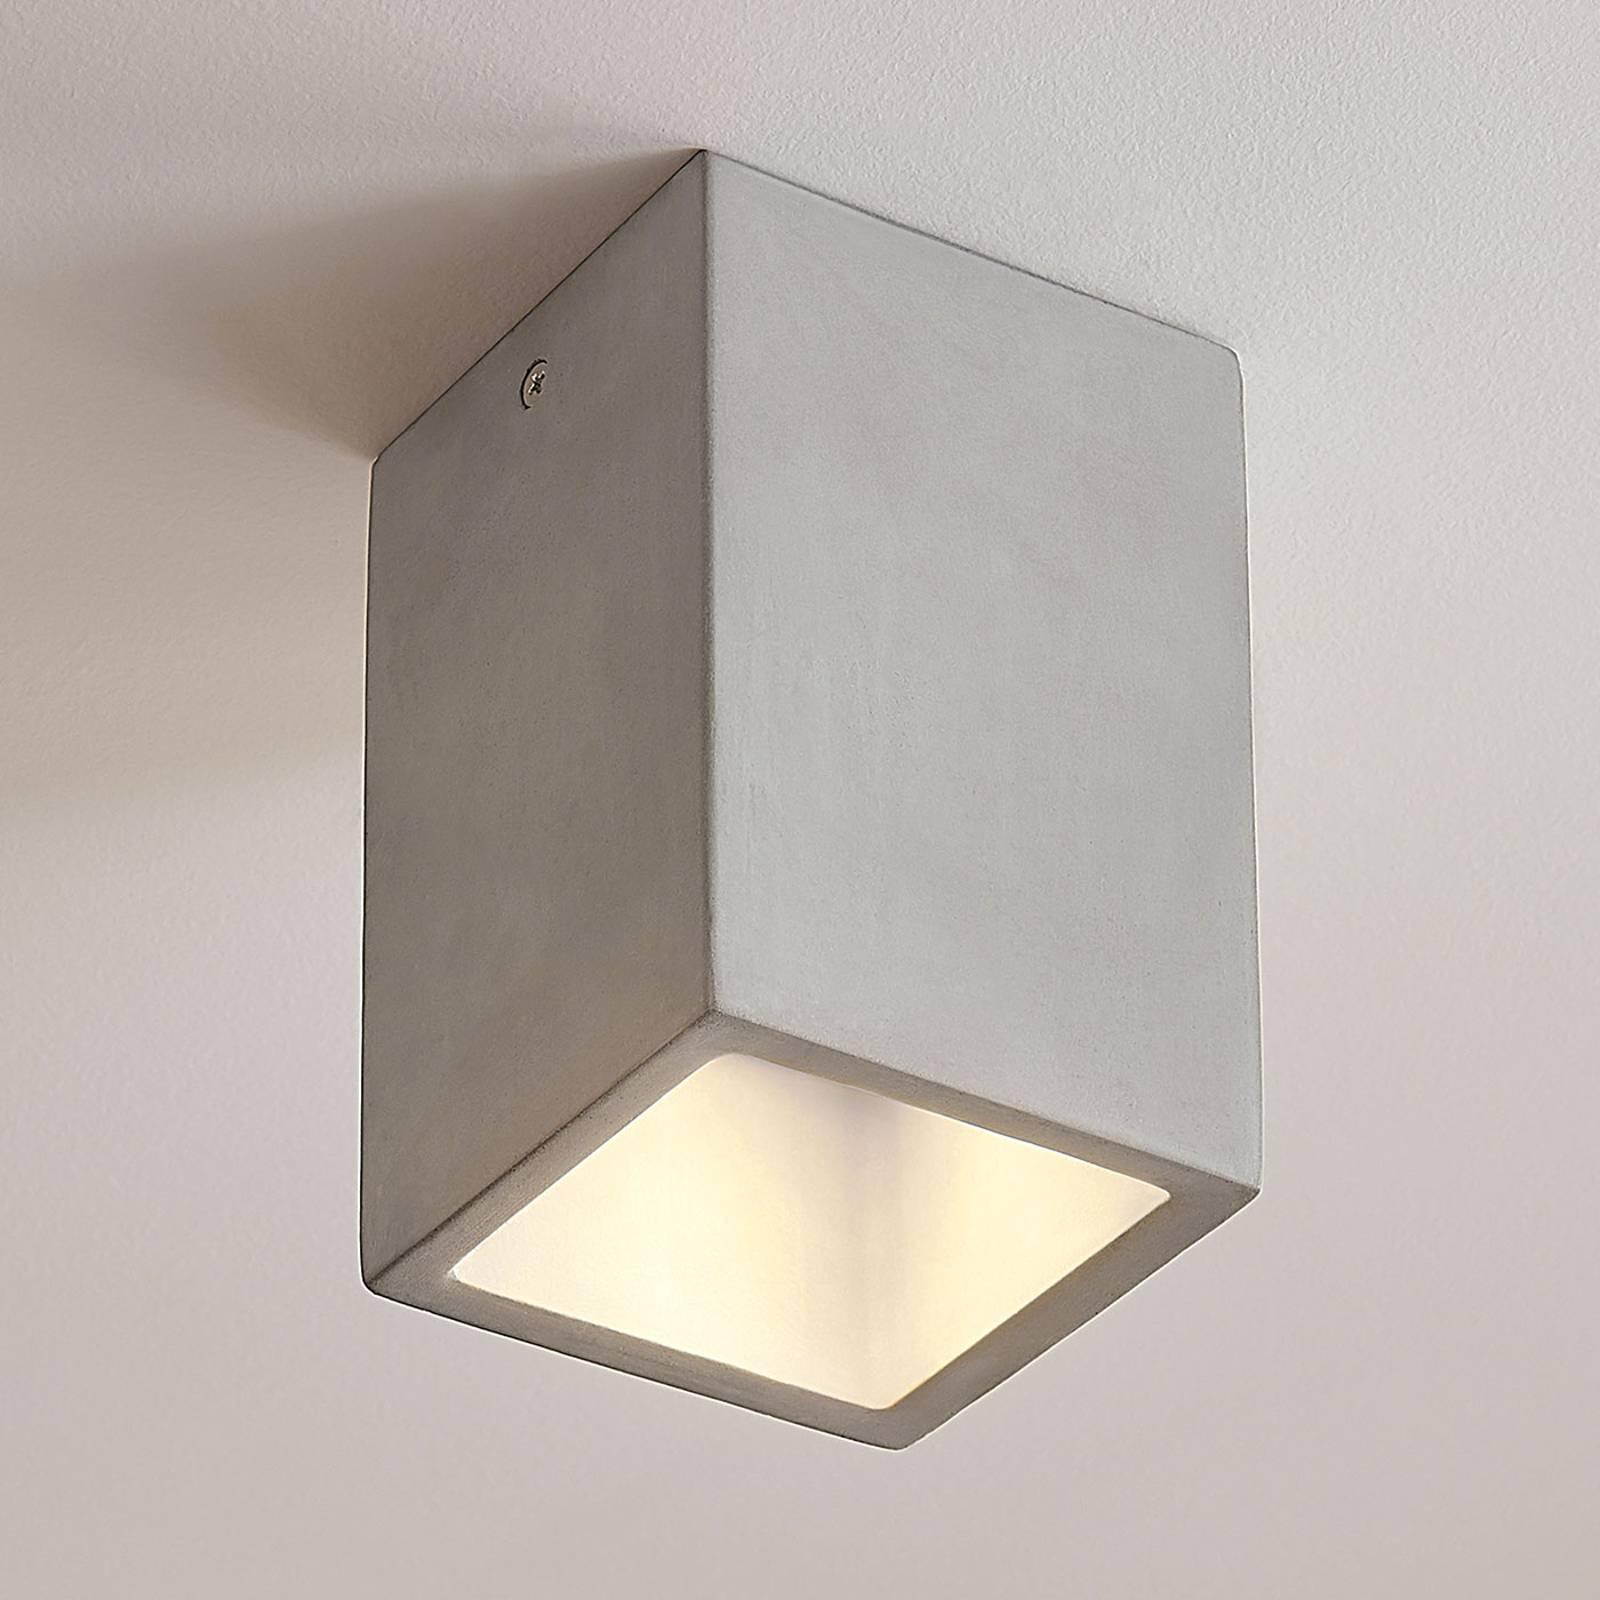 Concrete Ceiling Light Gerda With An Angular Shape Lights Co Uk